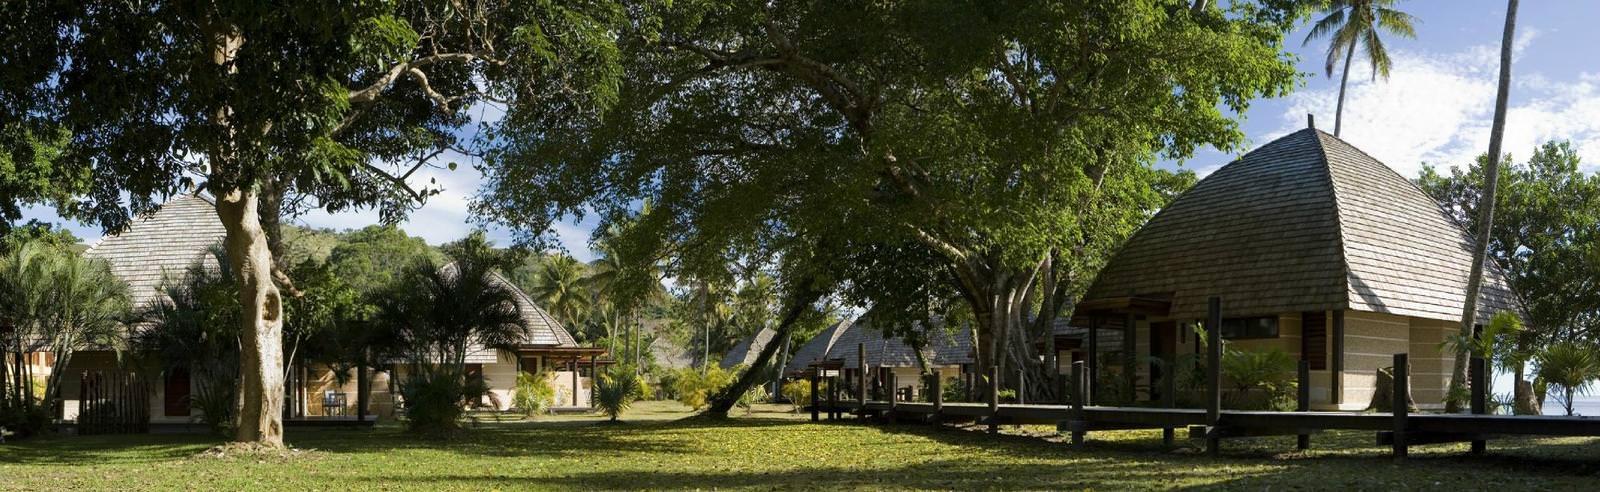 Ultimate List of Best Luxury Hotels in Hienghene, New Caledonia Hotel Tieti